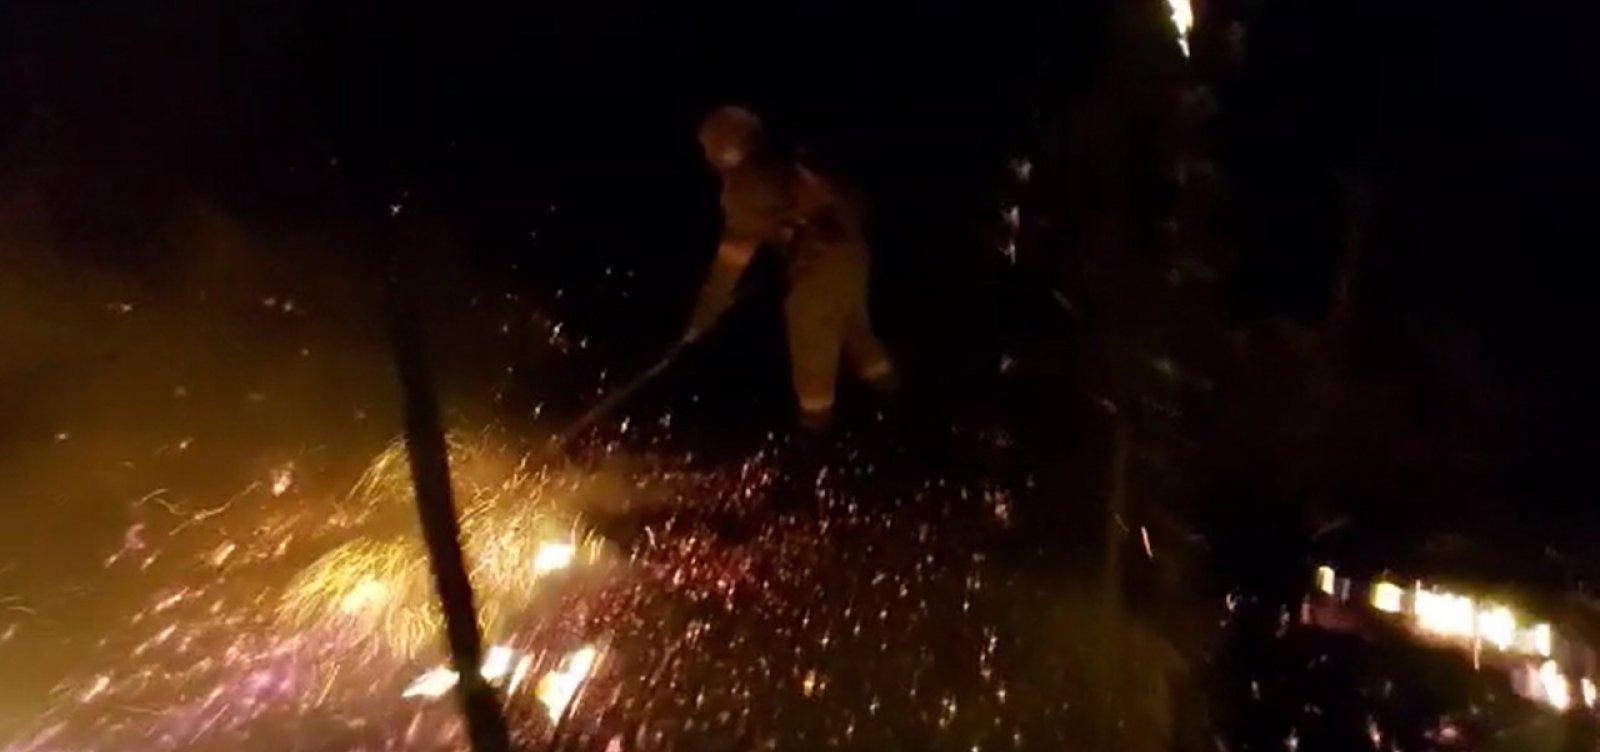 Brigadistas passam noite no combate a incêndio na Chapada; veja vídeo